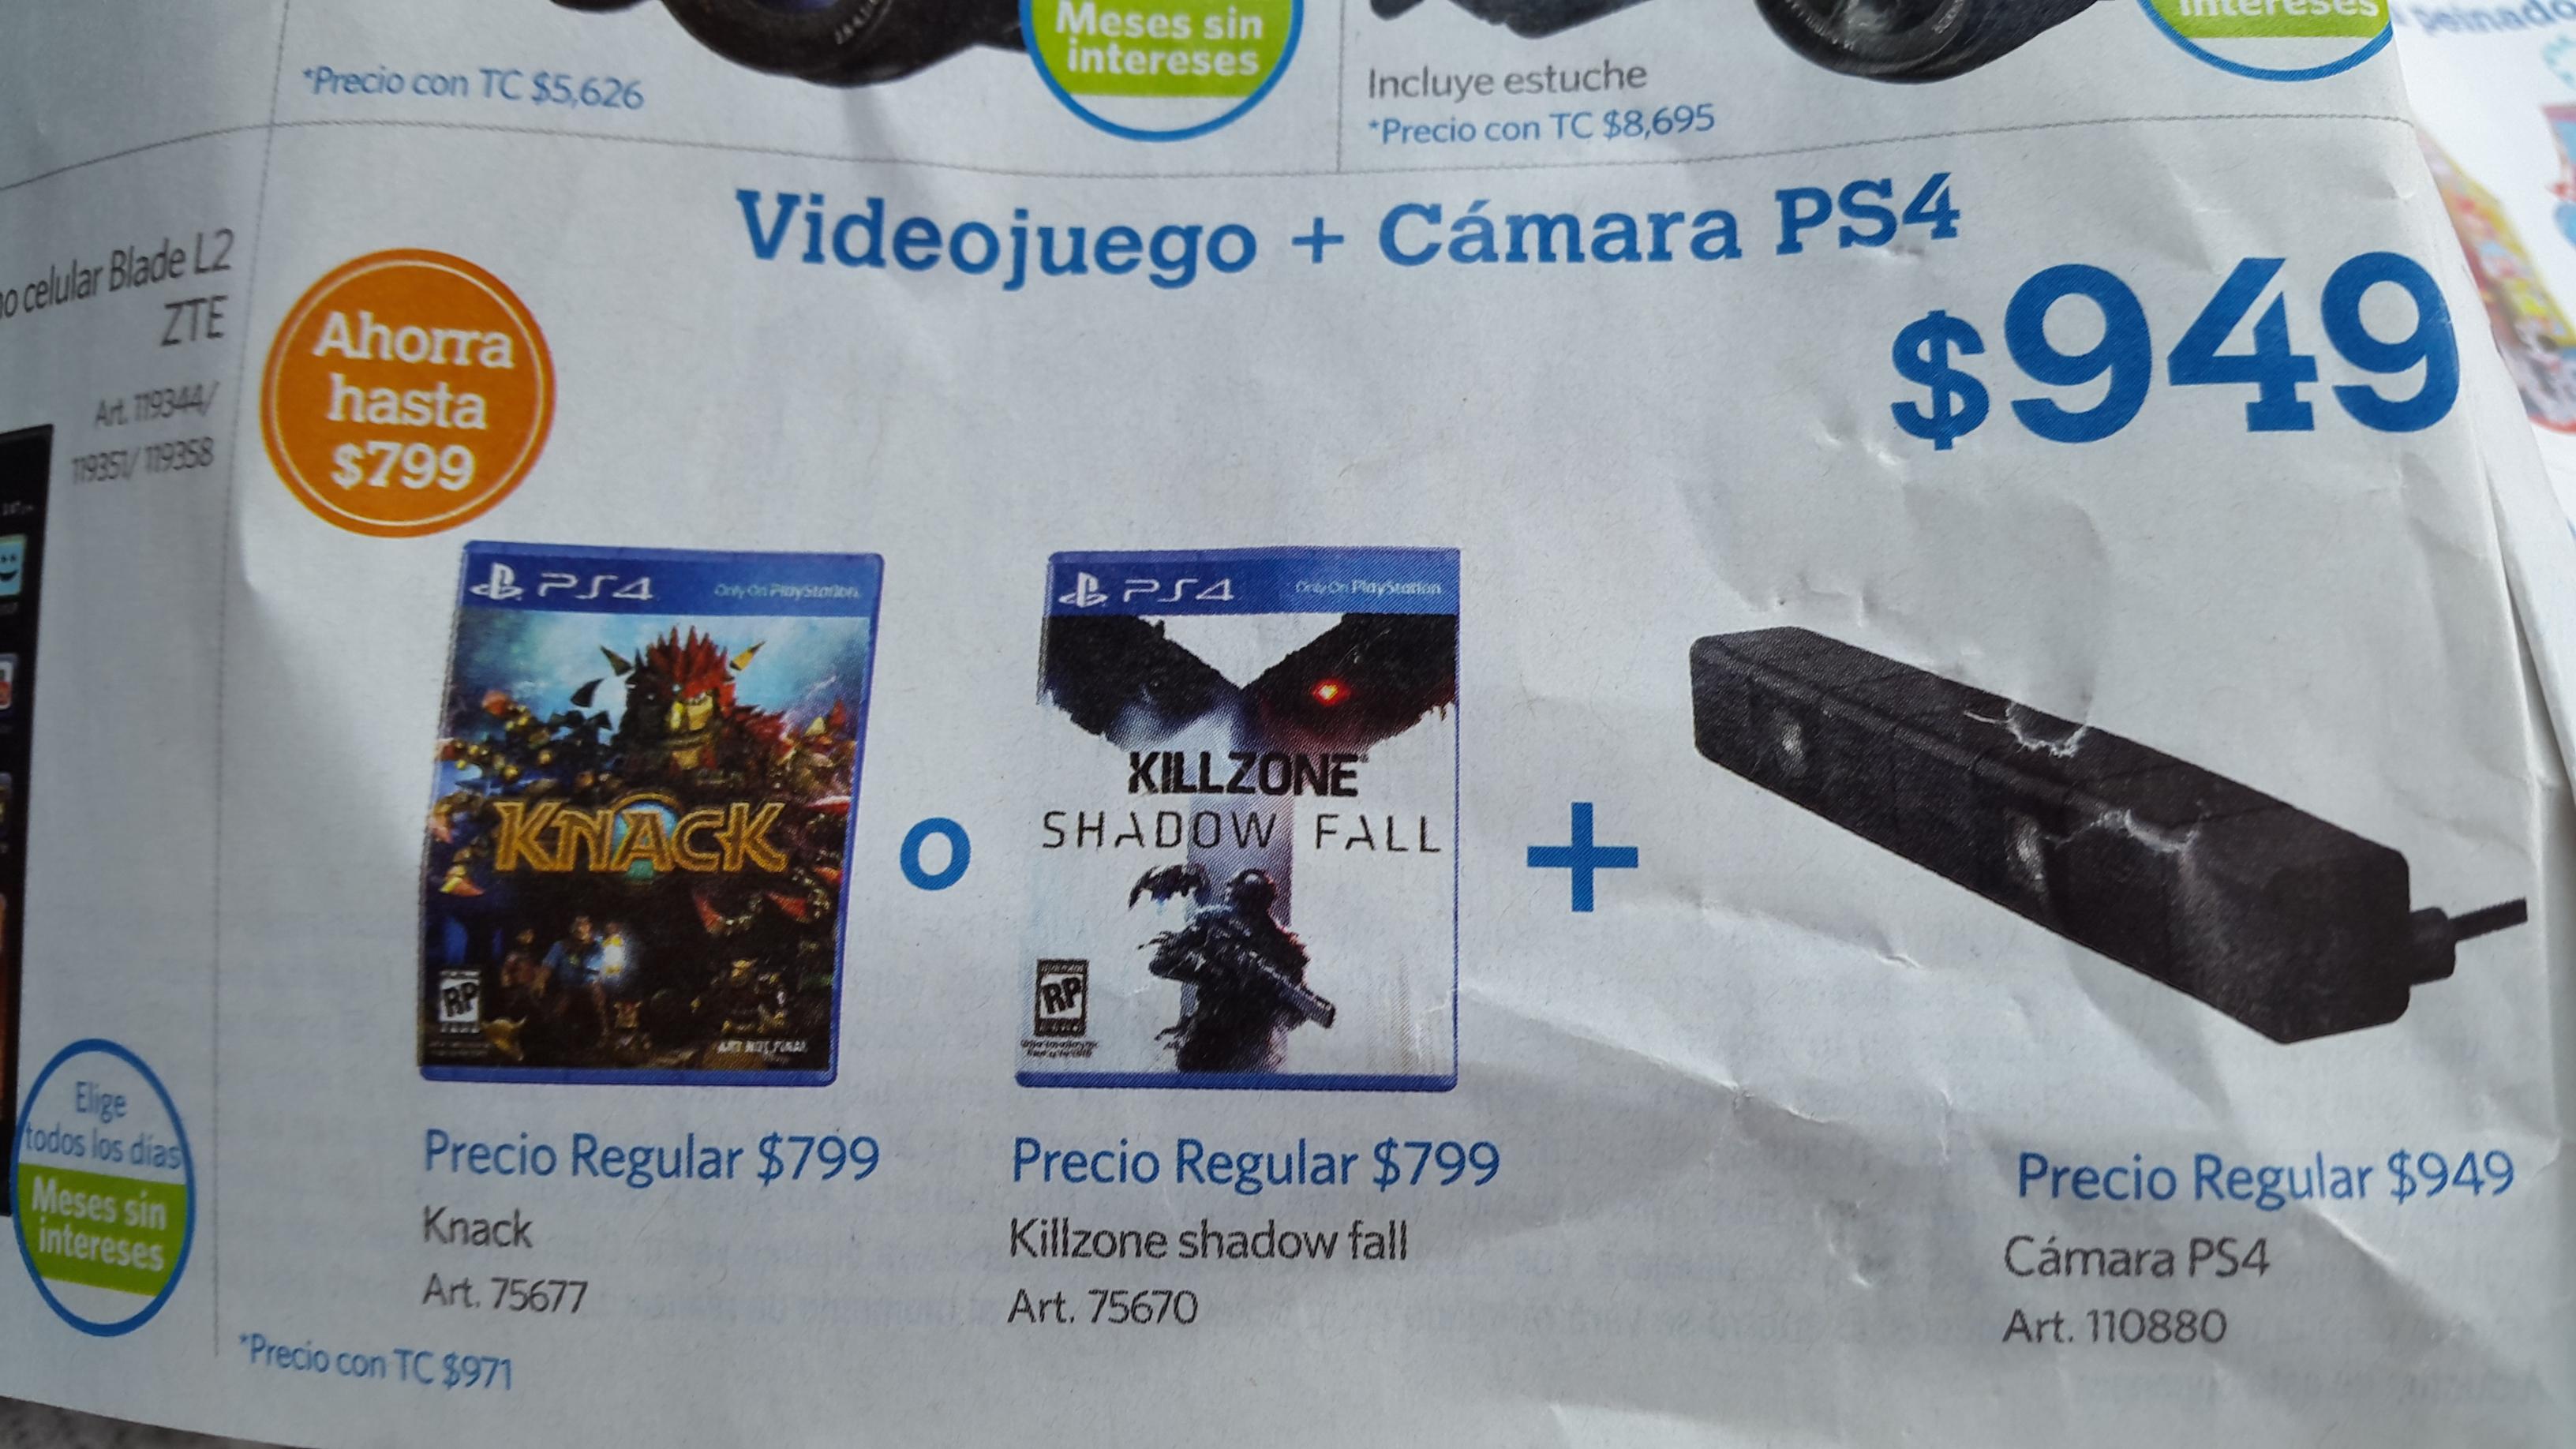 Sam's Club: cámara PlayStation 4 + videojuego $949